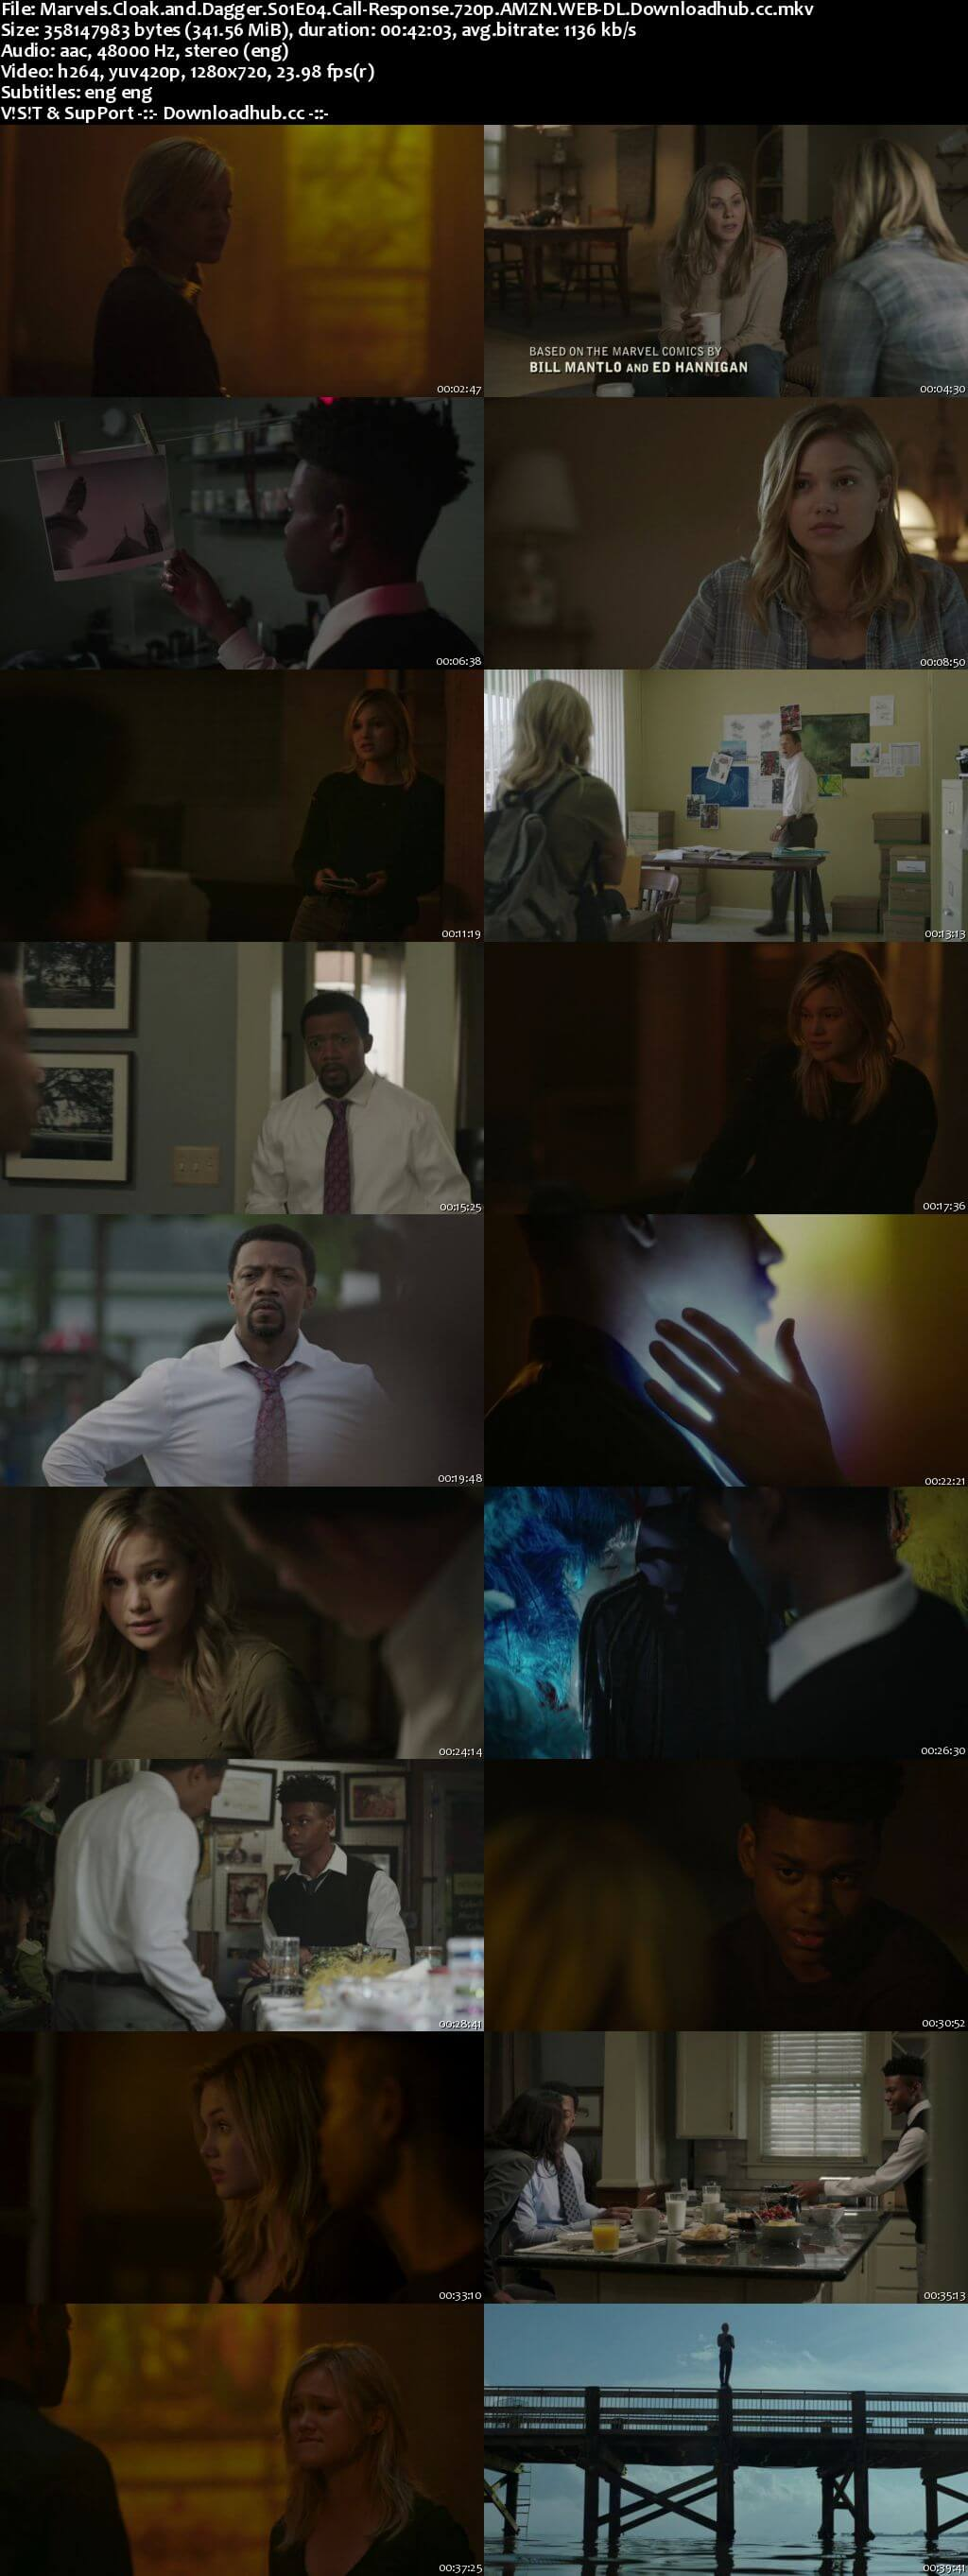 Cloak & Dagger S01E04 340MB WEB-DL 720p ESubs